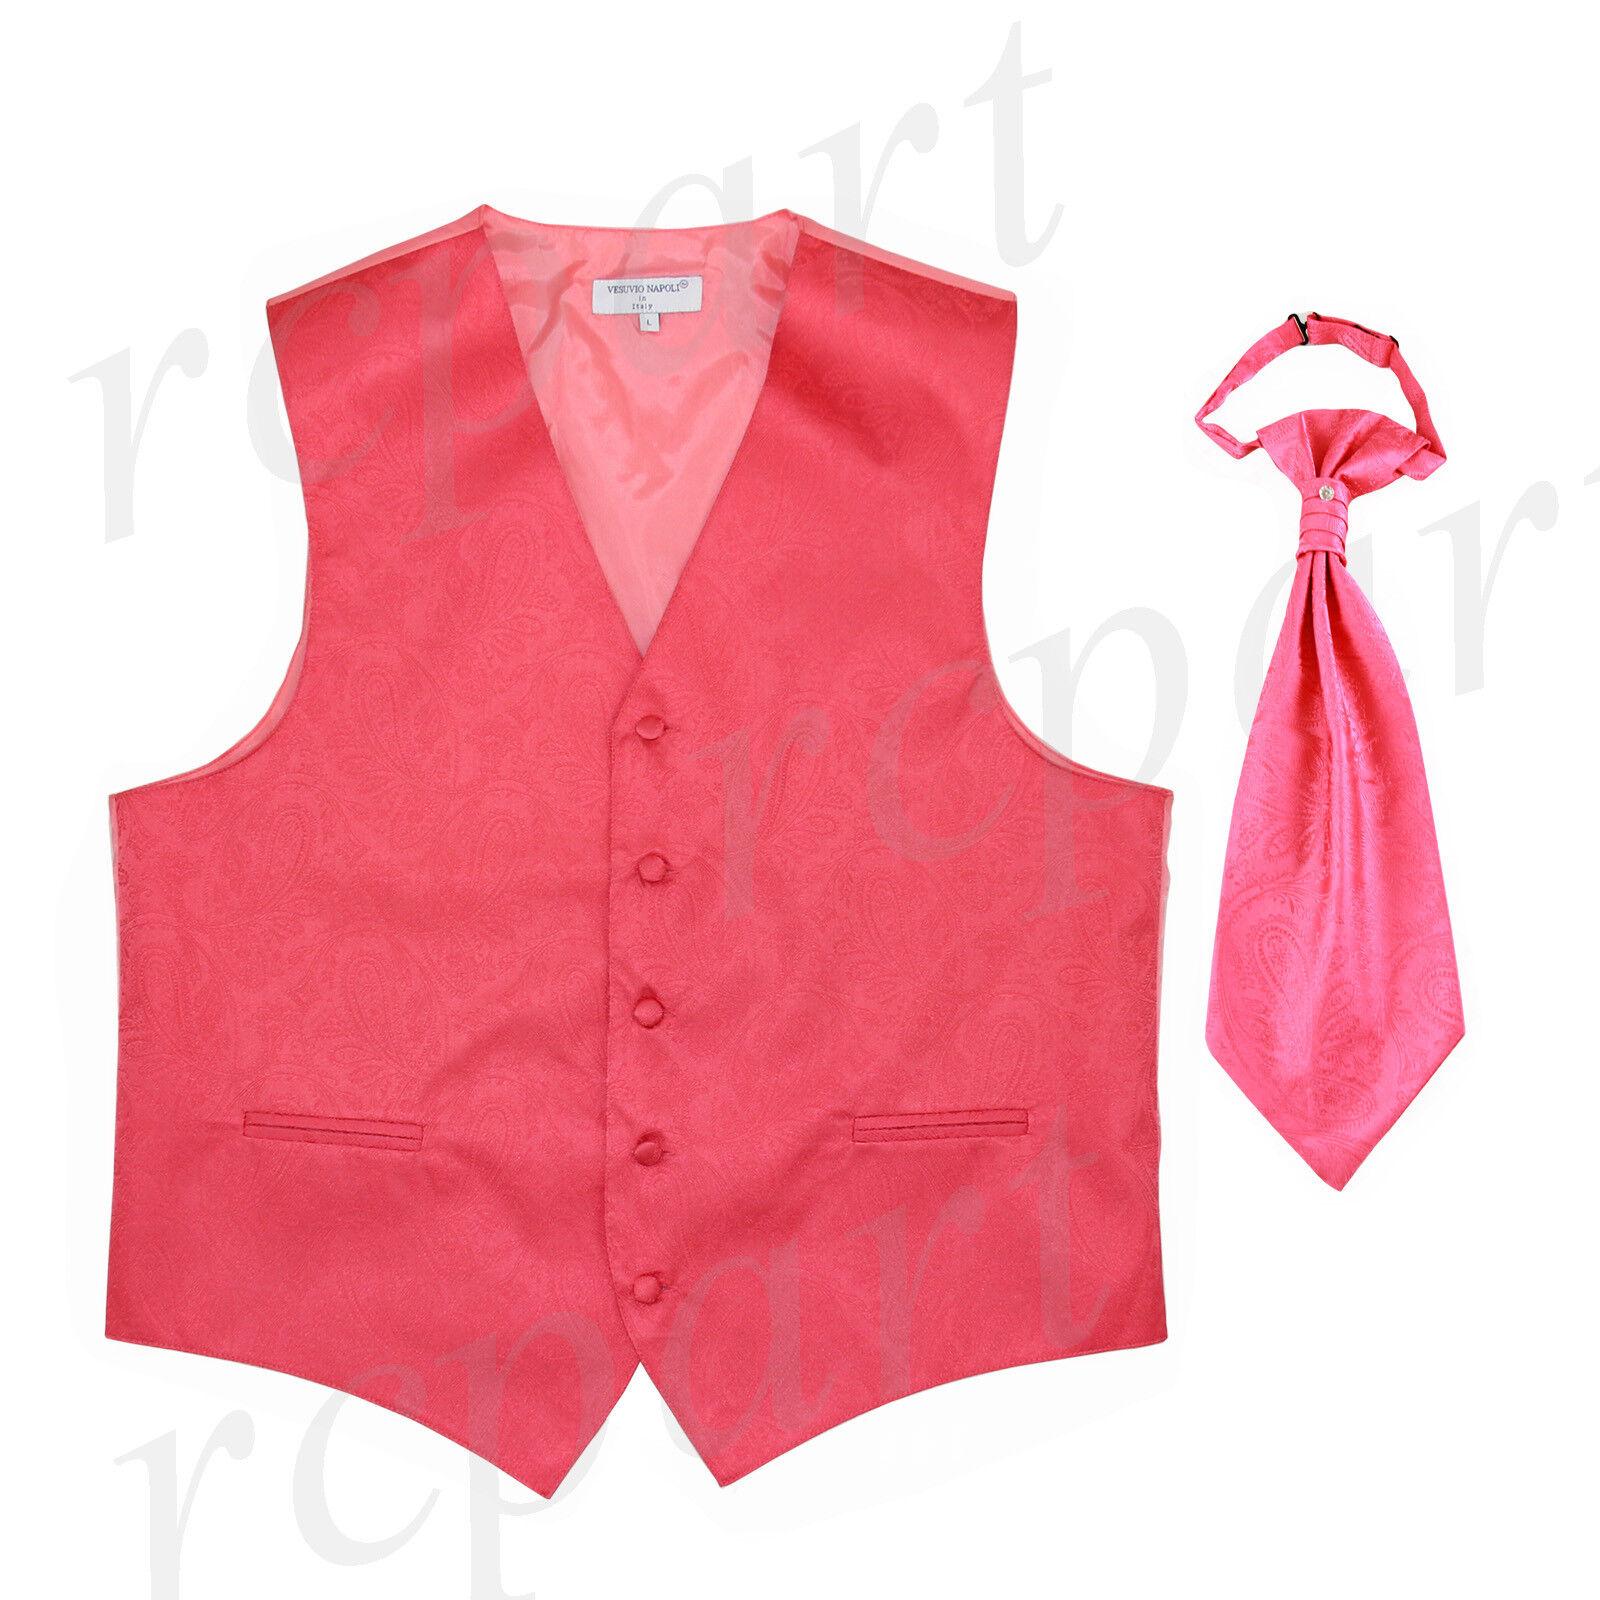 New Men's Vesuvio Napoli Paisley Tuxedo Vest Ascot Cravat prom party Coral